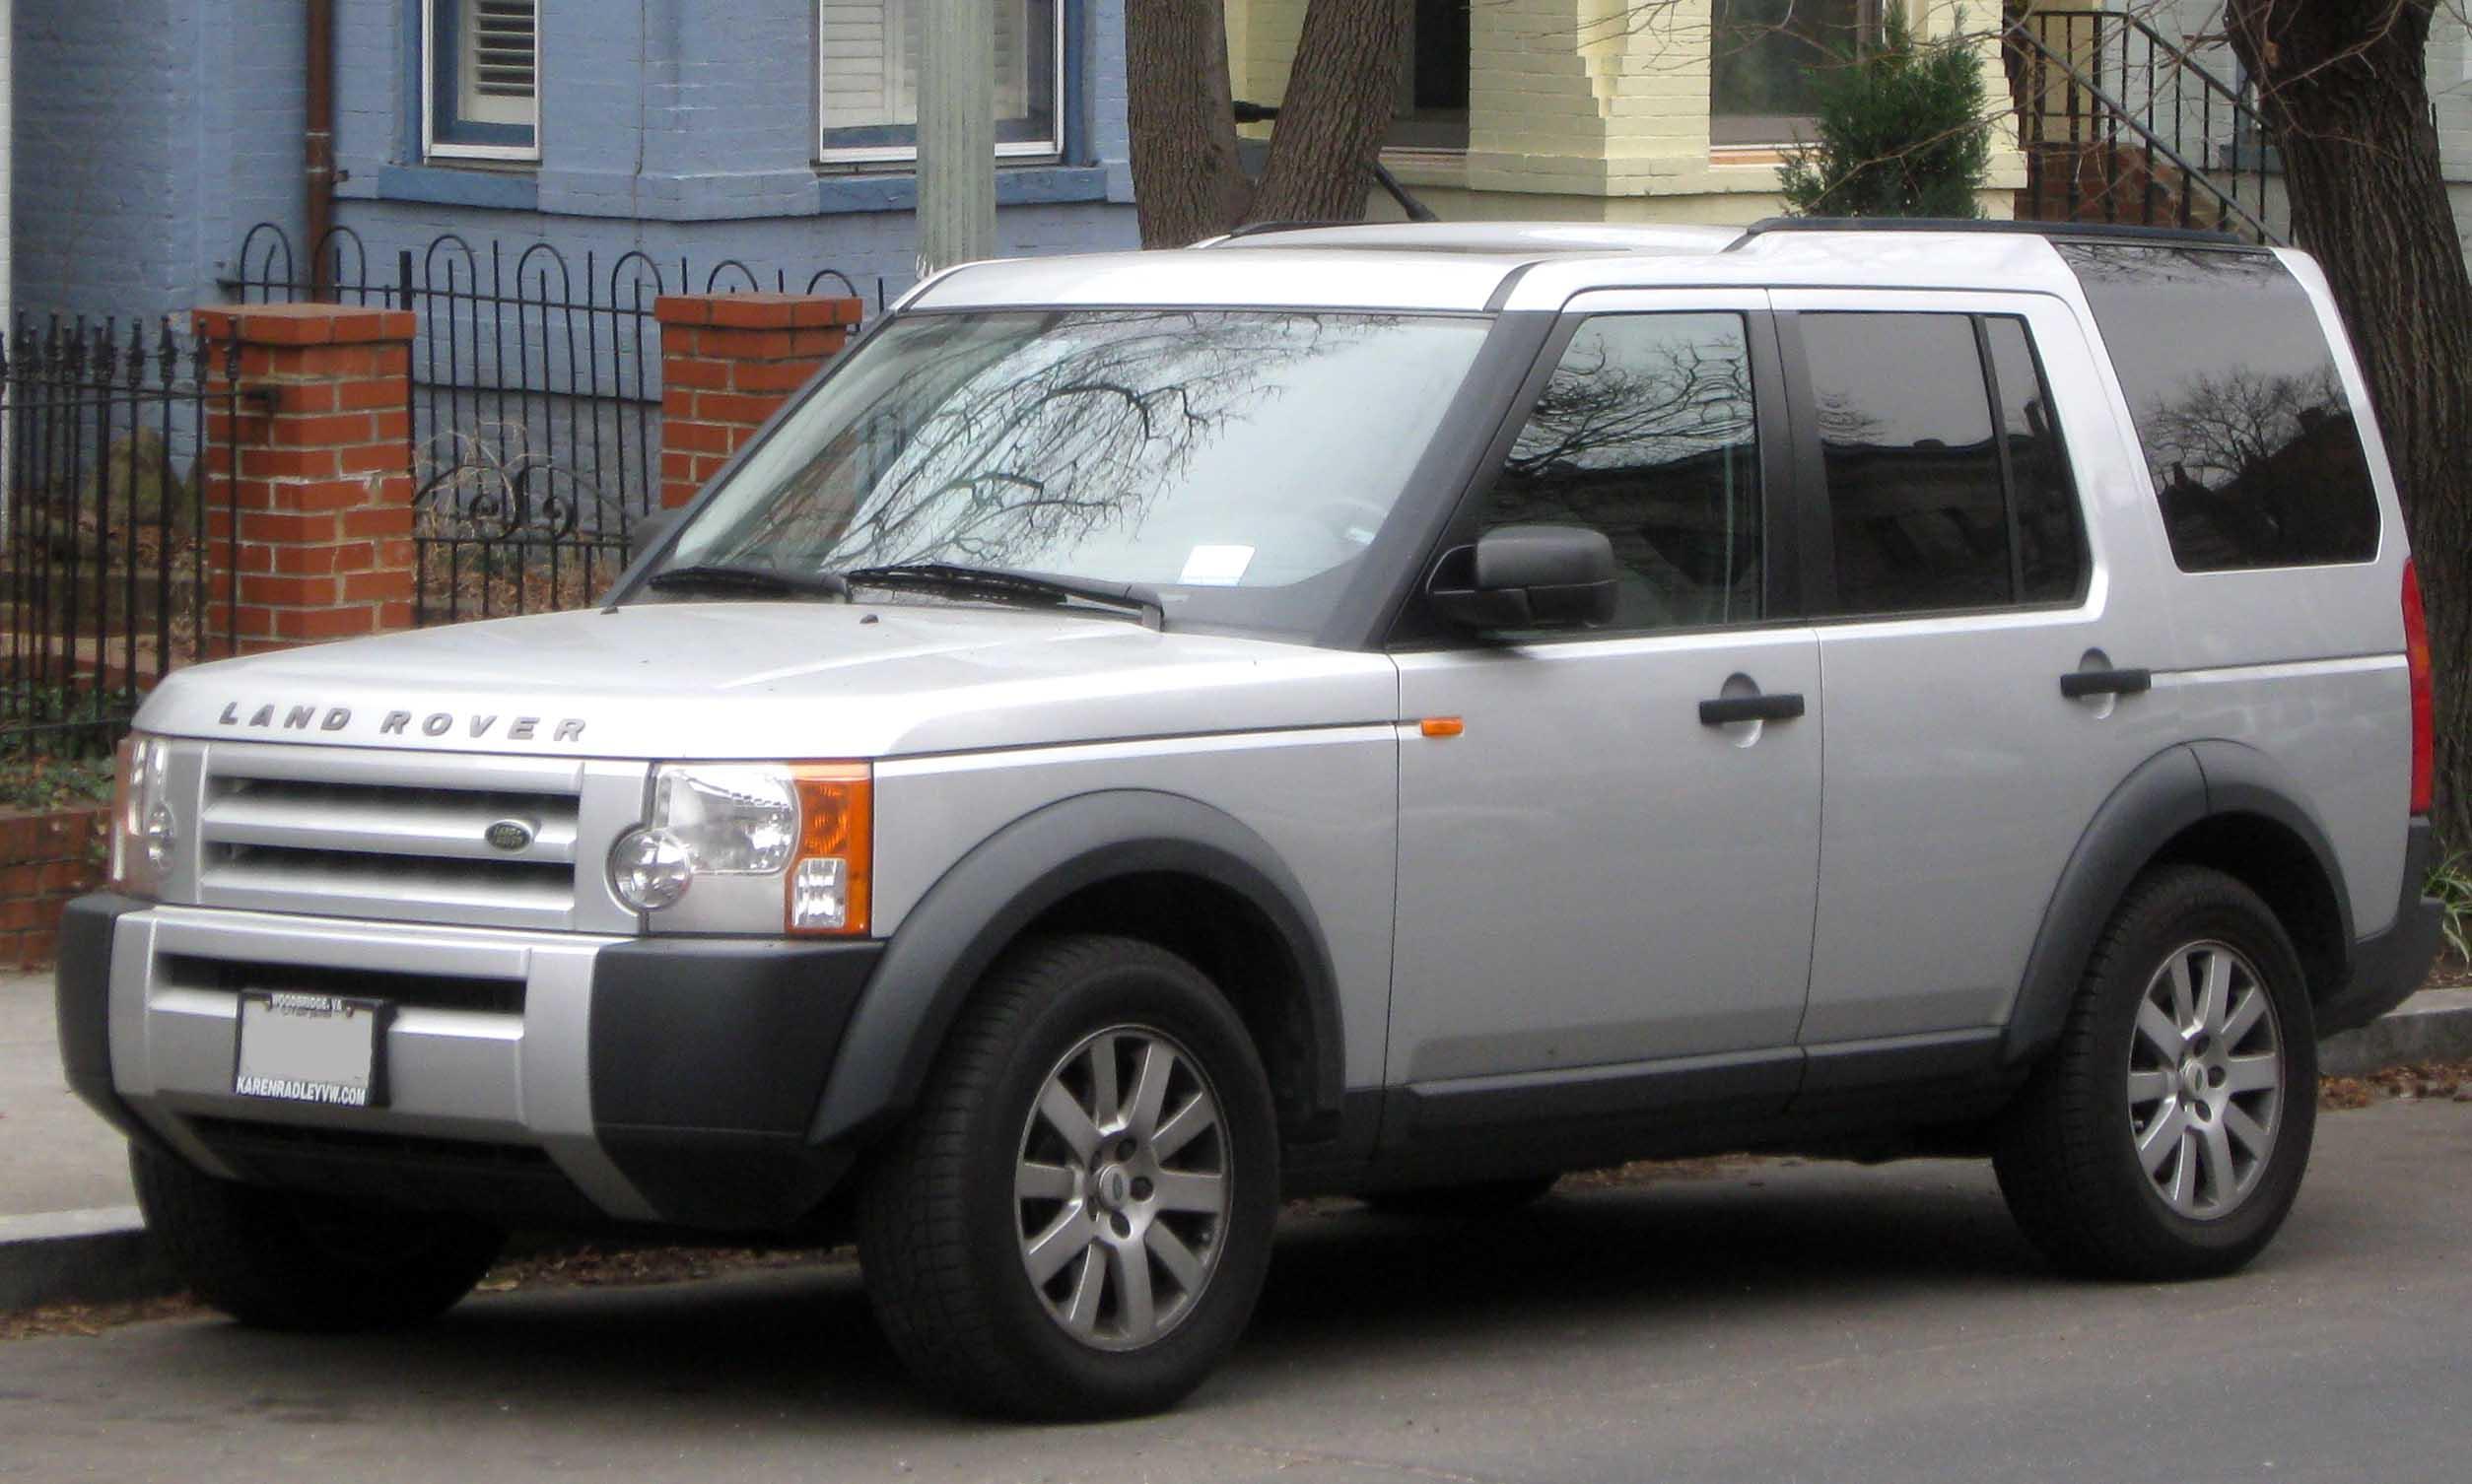 land rover lr3 images start 0 WeiLi Automotive Network